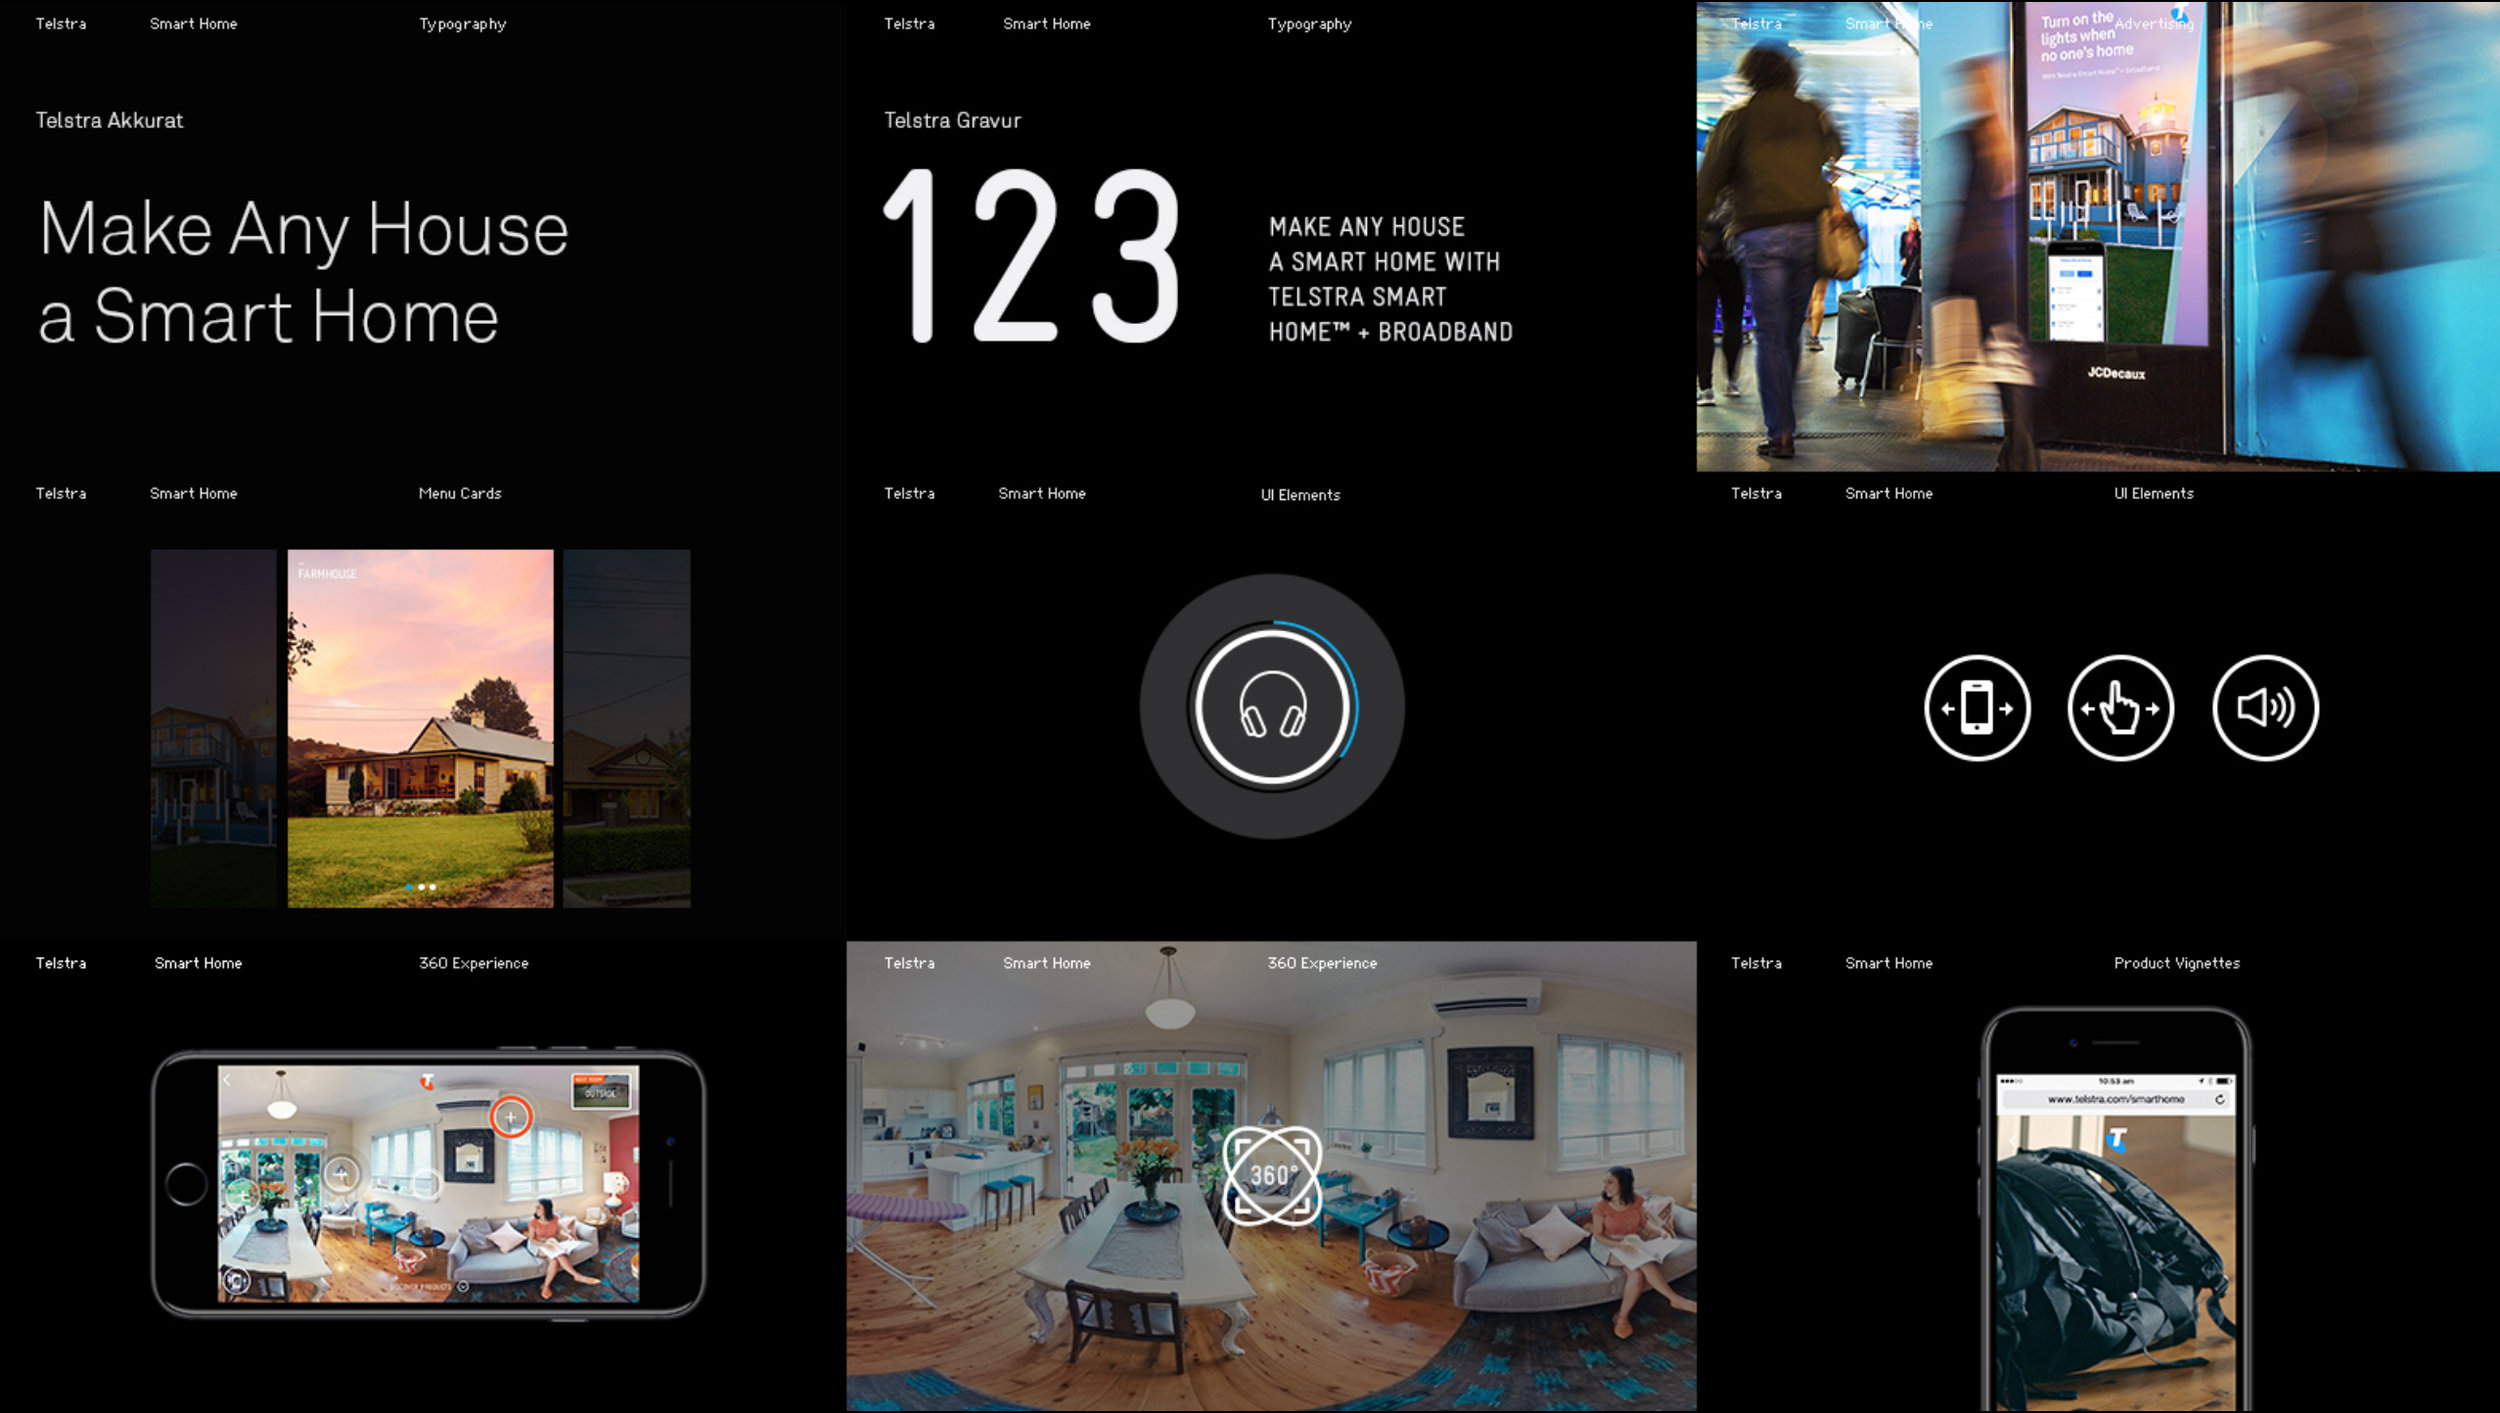 UI_Screens.jpg